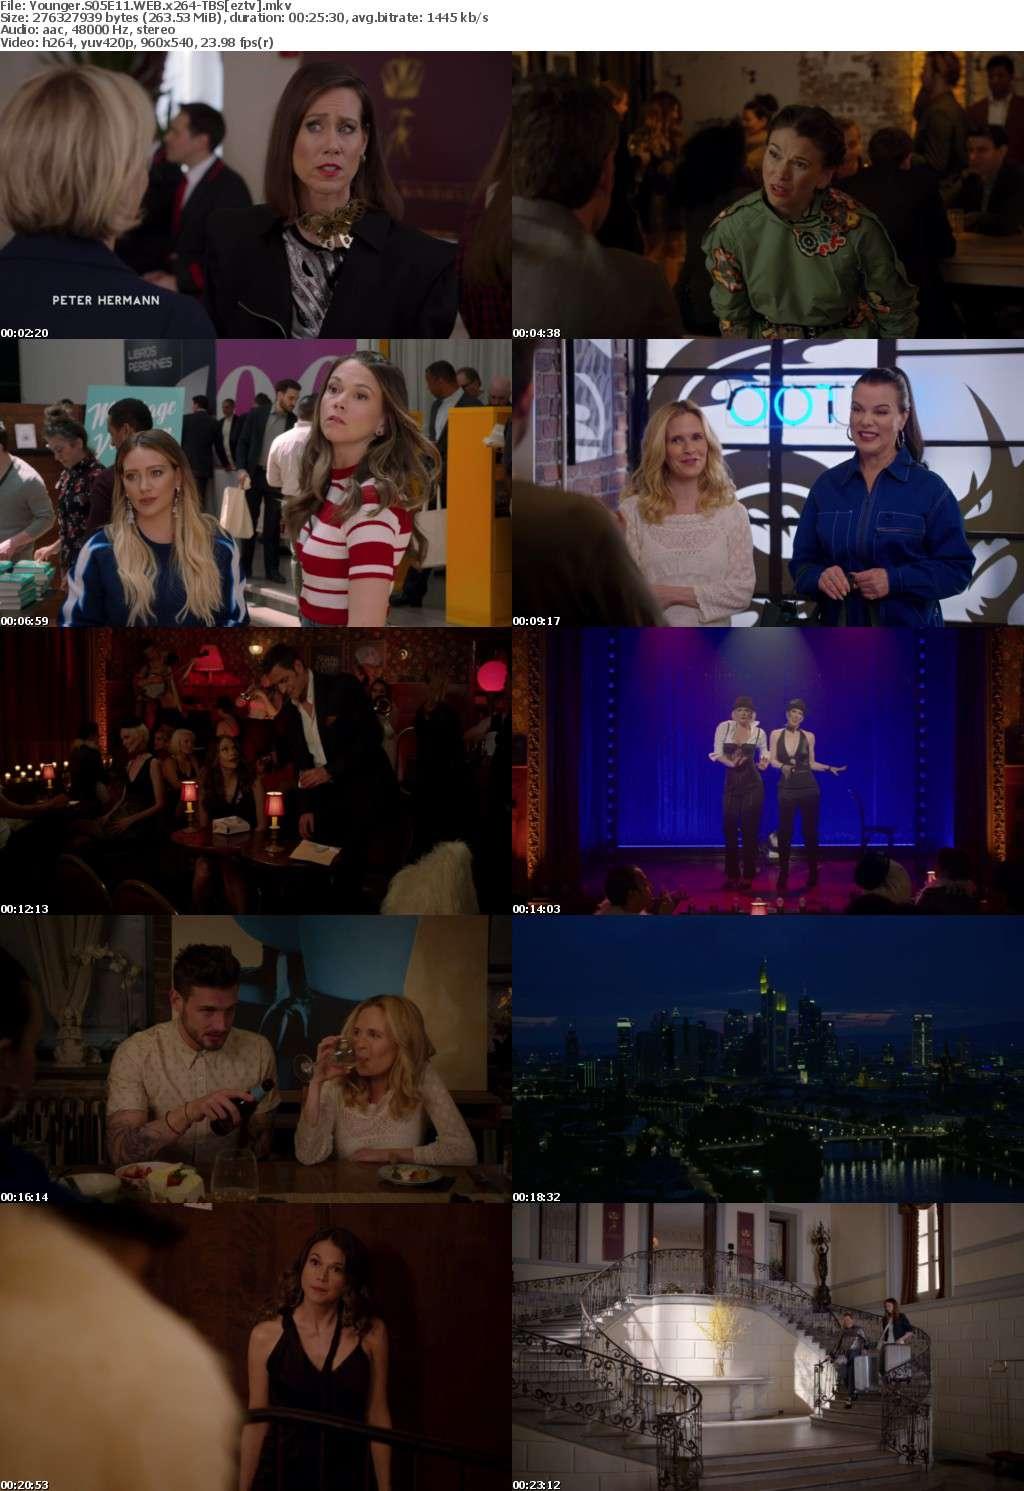 Younger S05E11 WEB x264-TBS